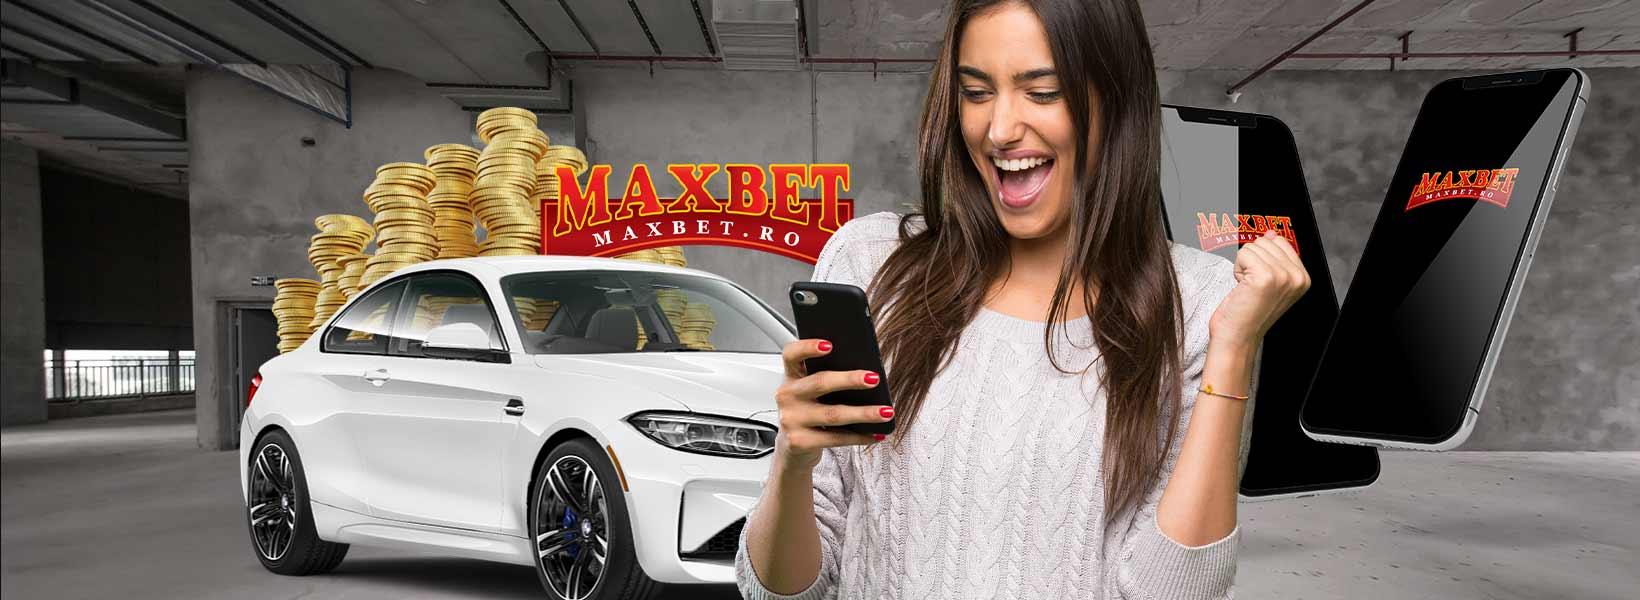 promoții maxbet